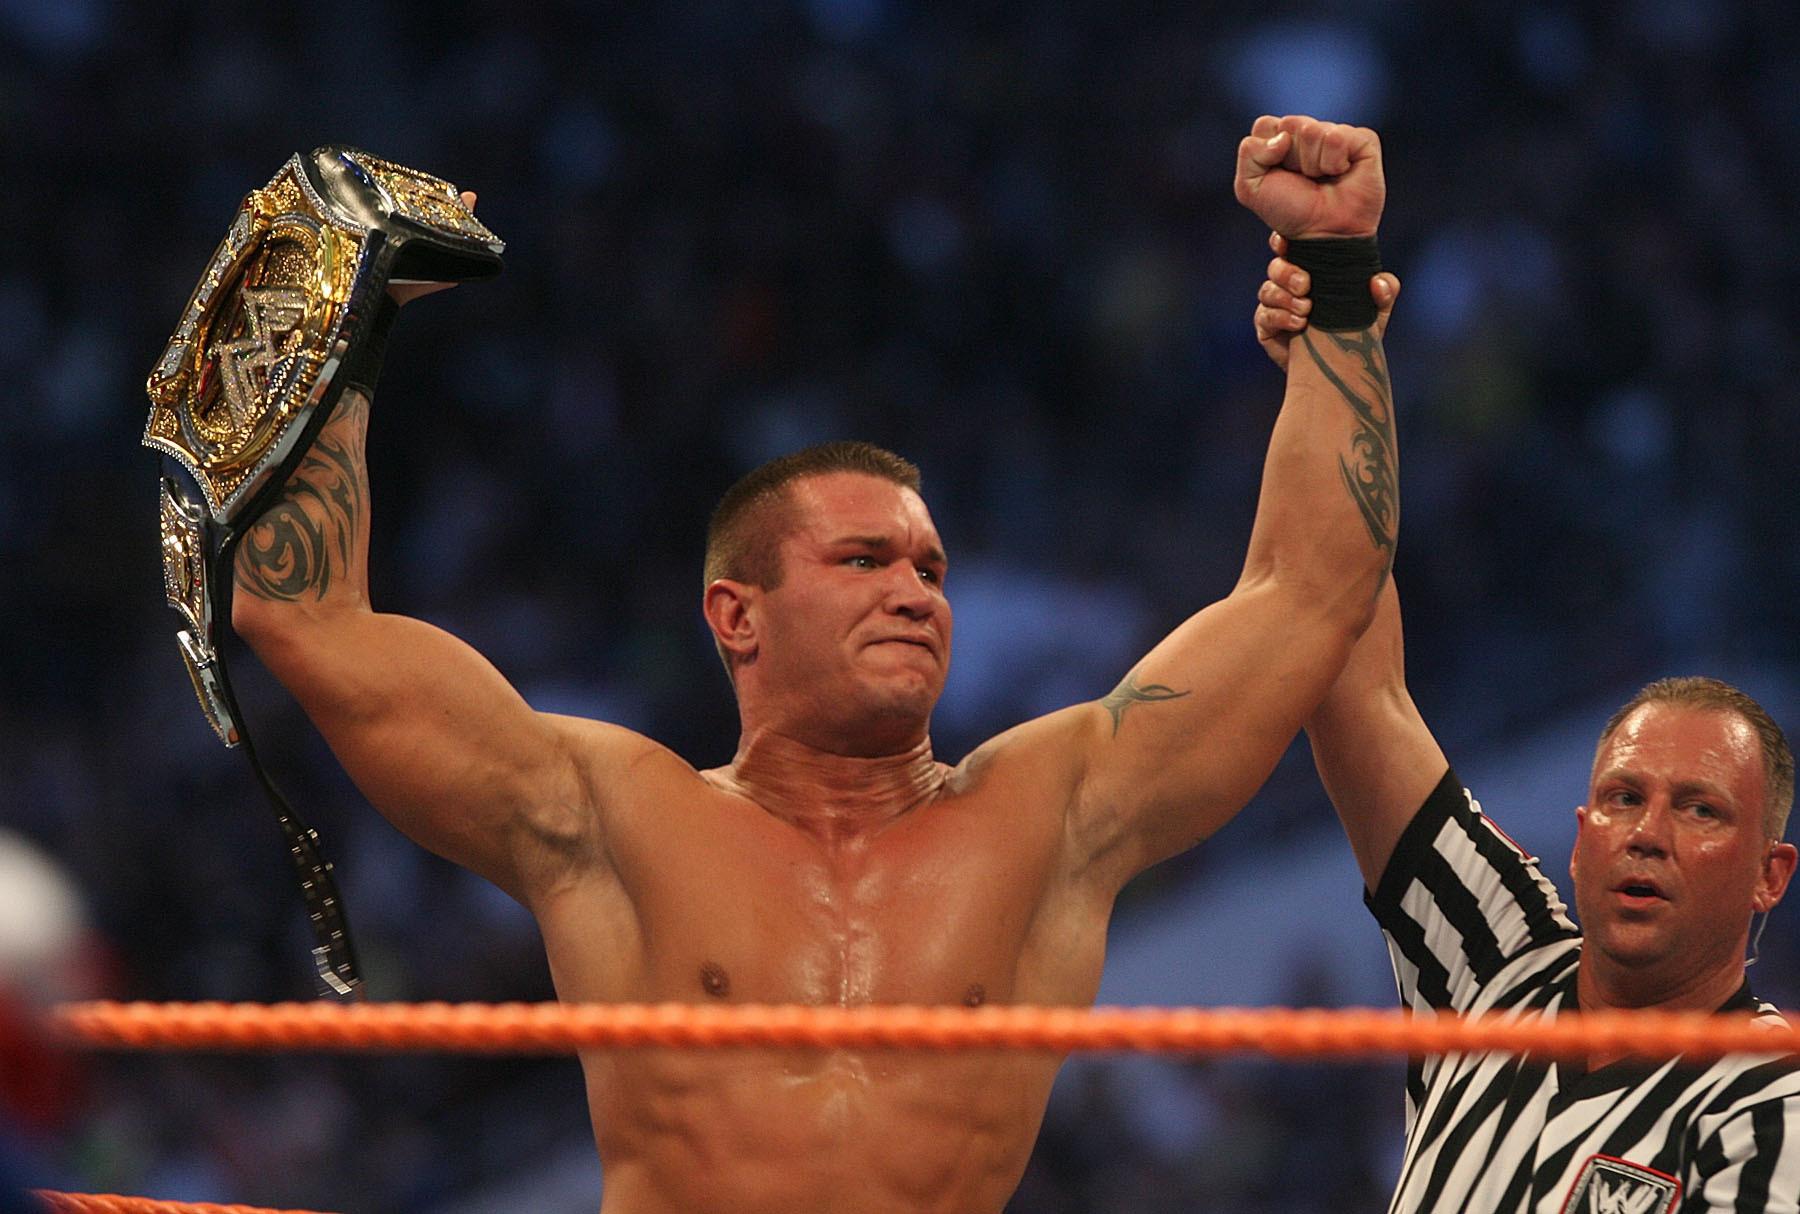 7. Randy Orton